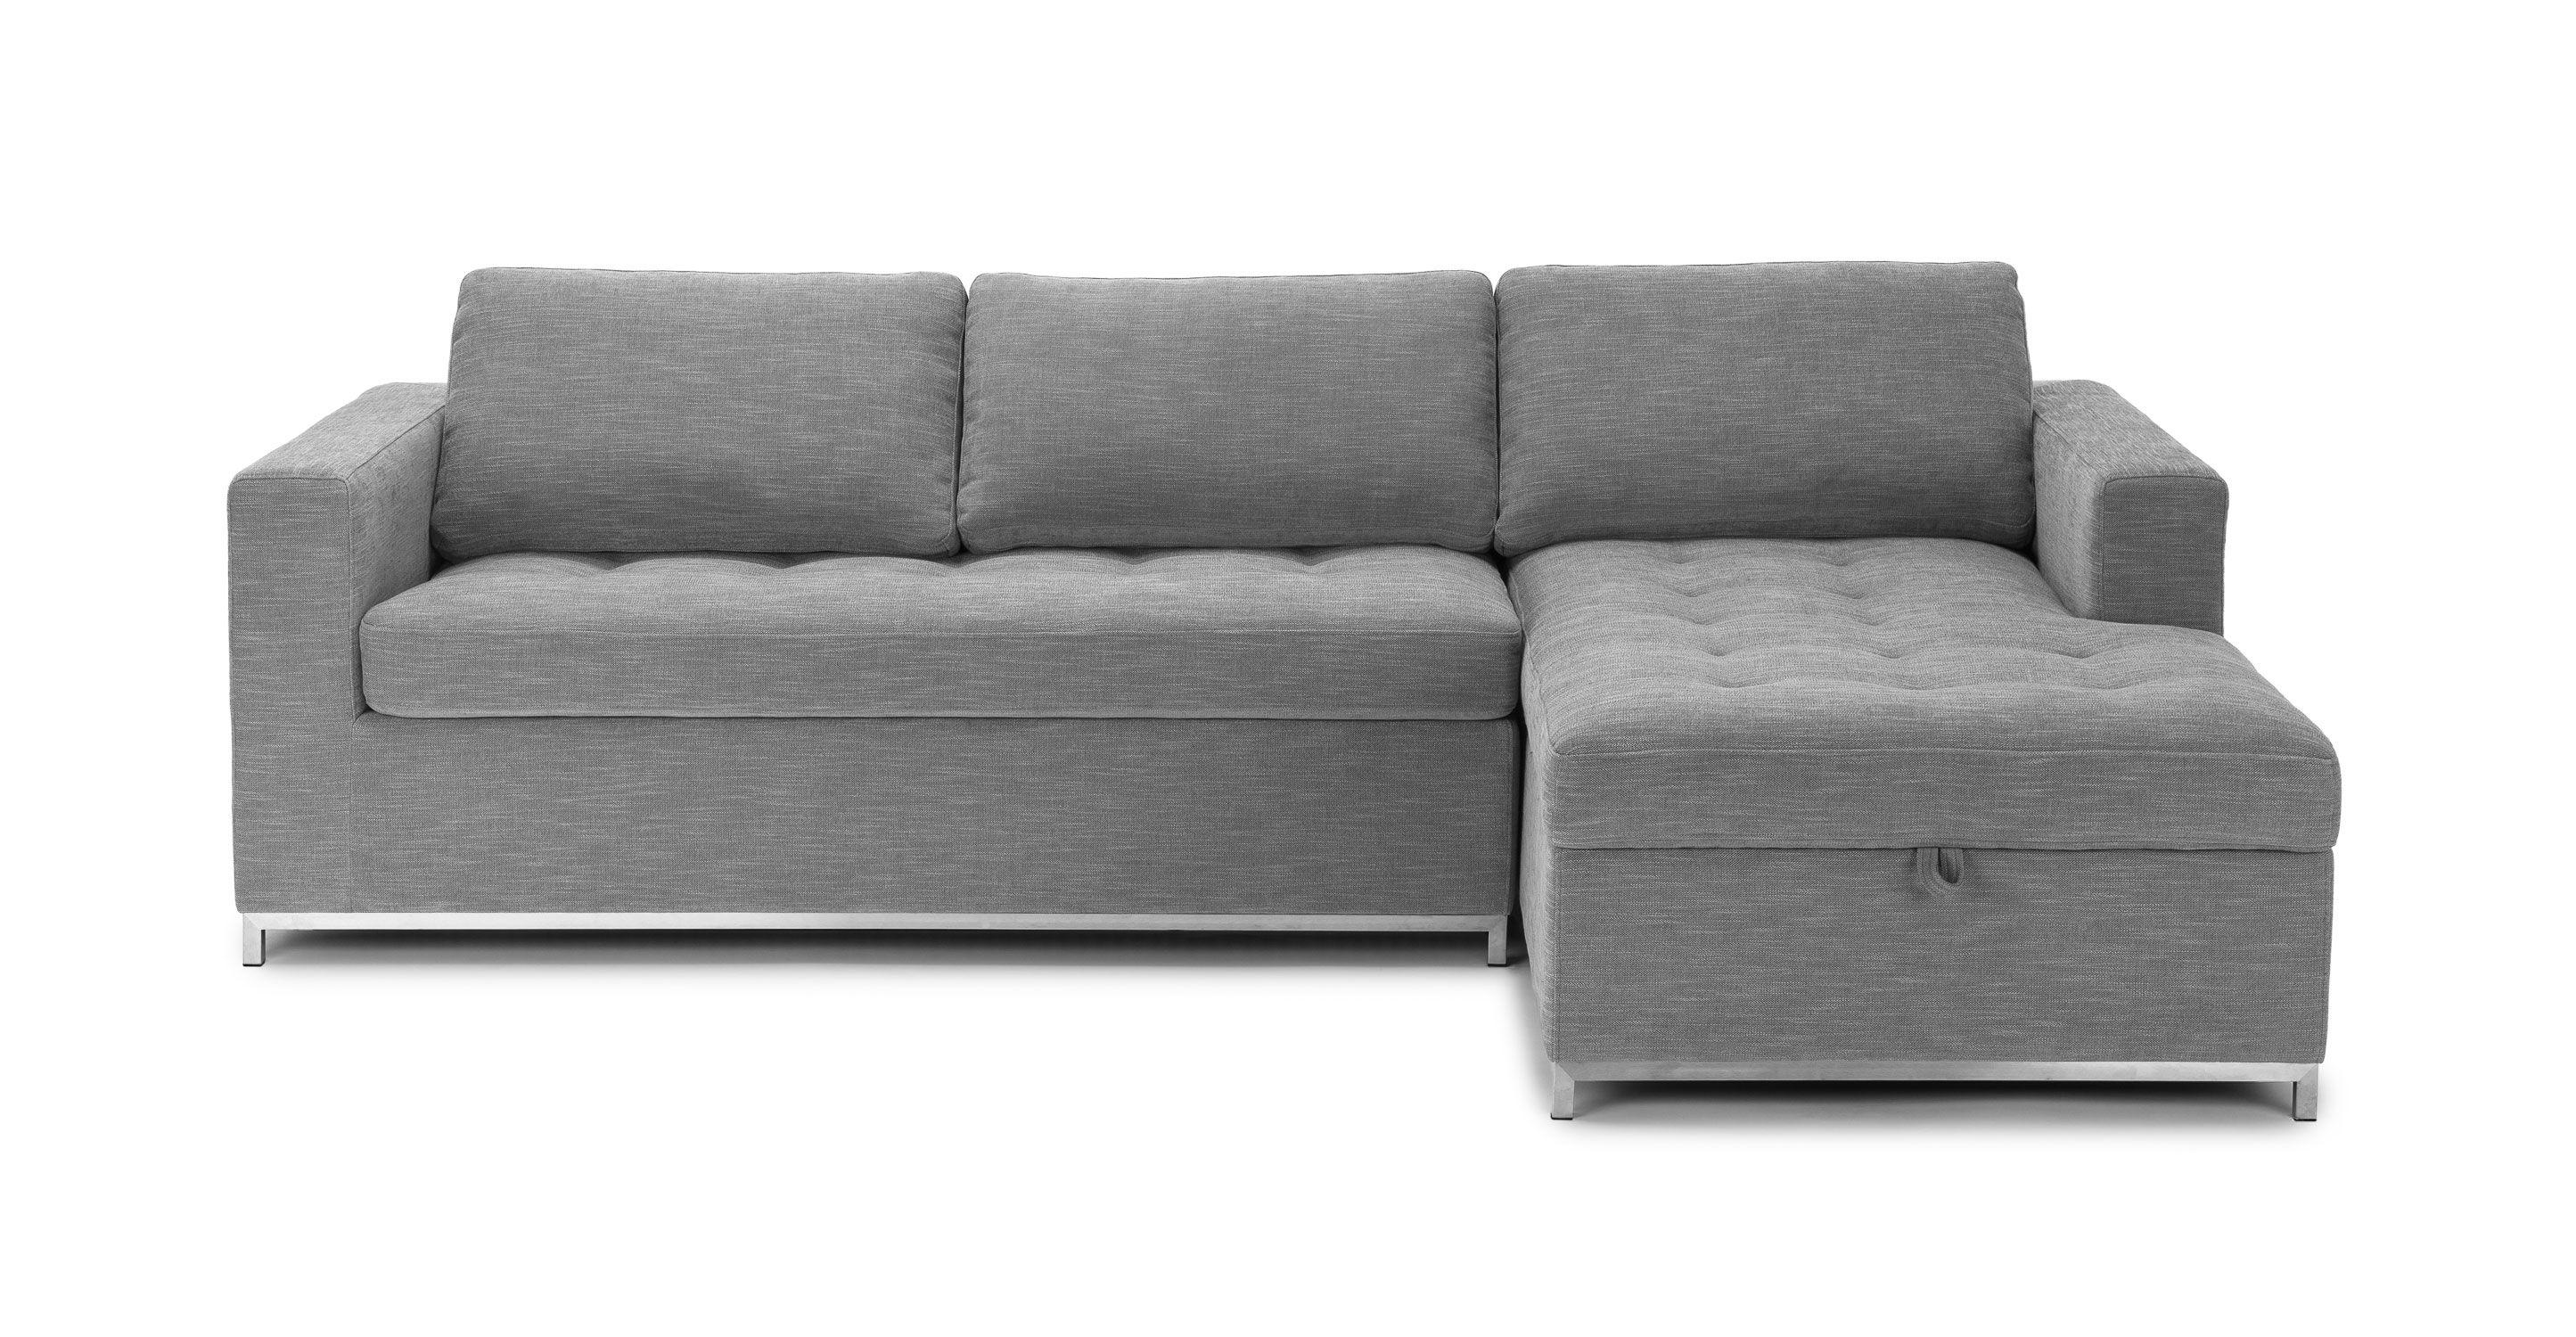 Article soma dawn gray right sofa bed